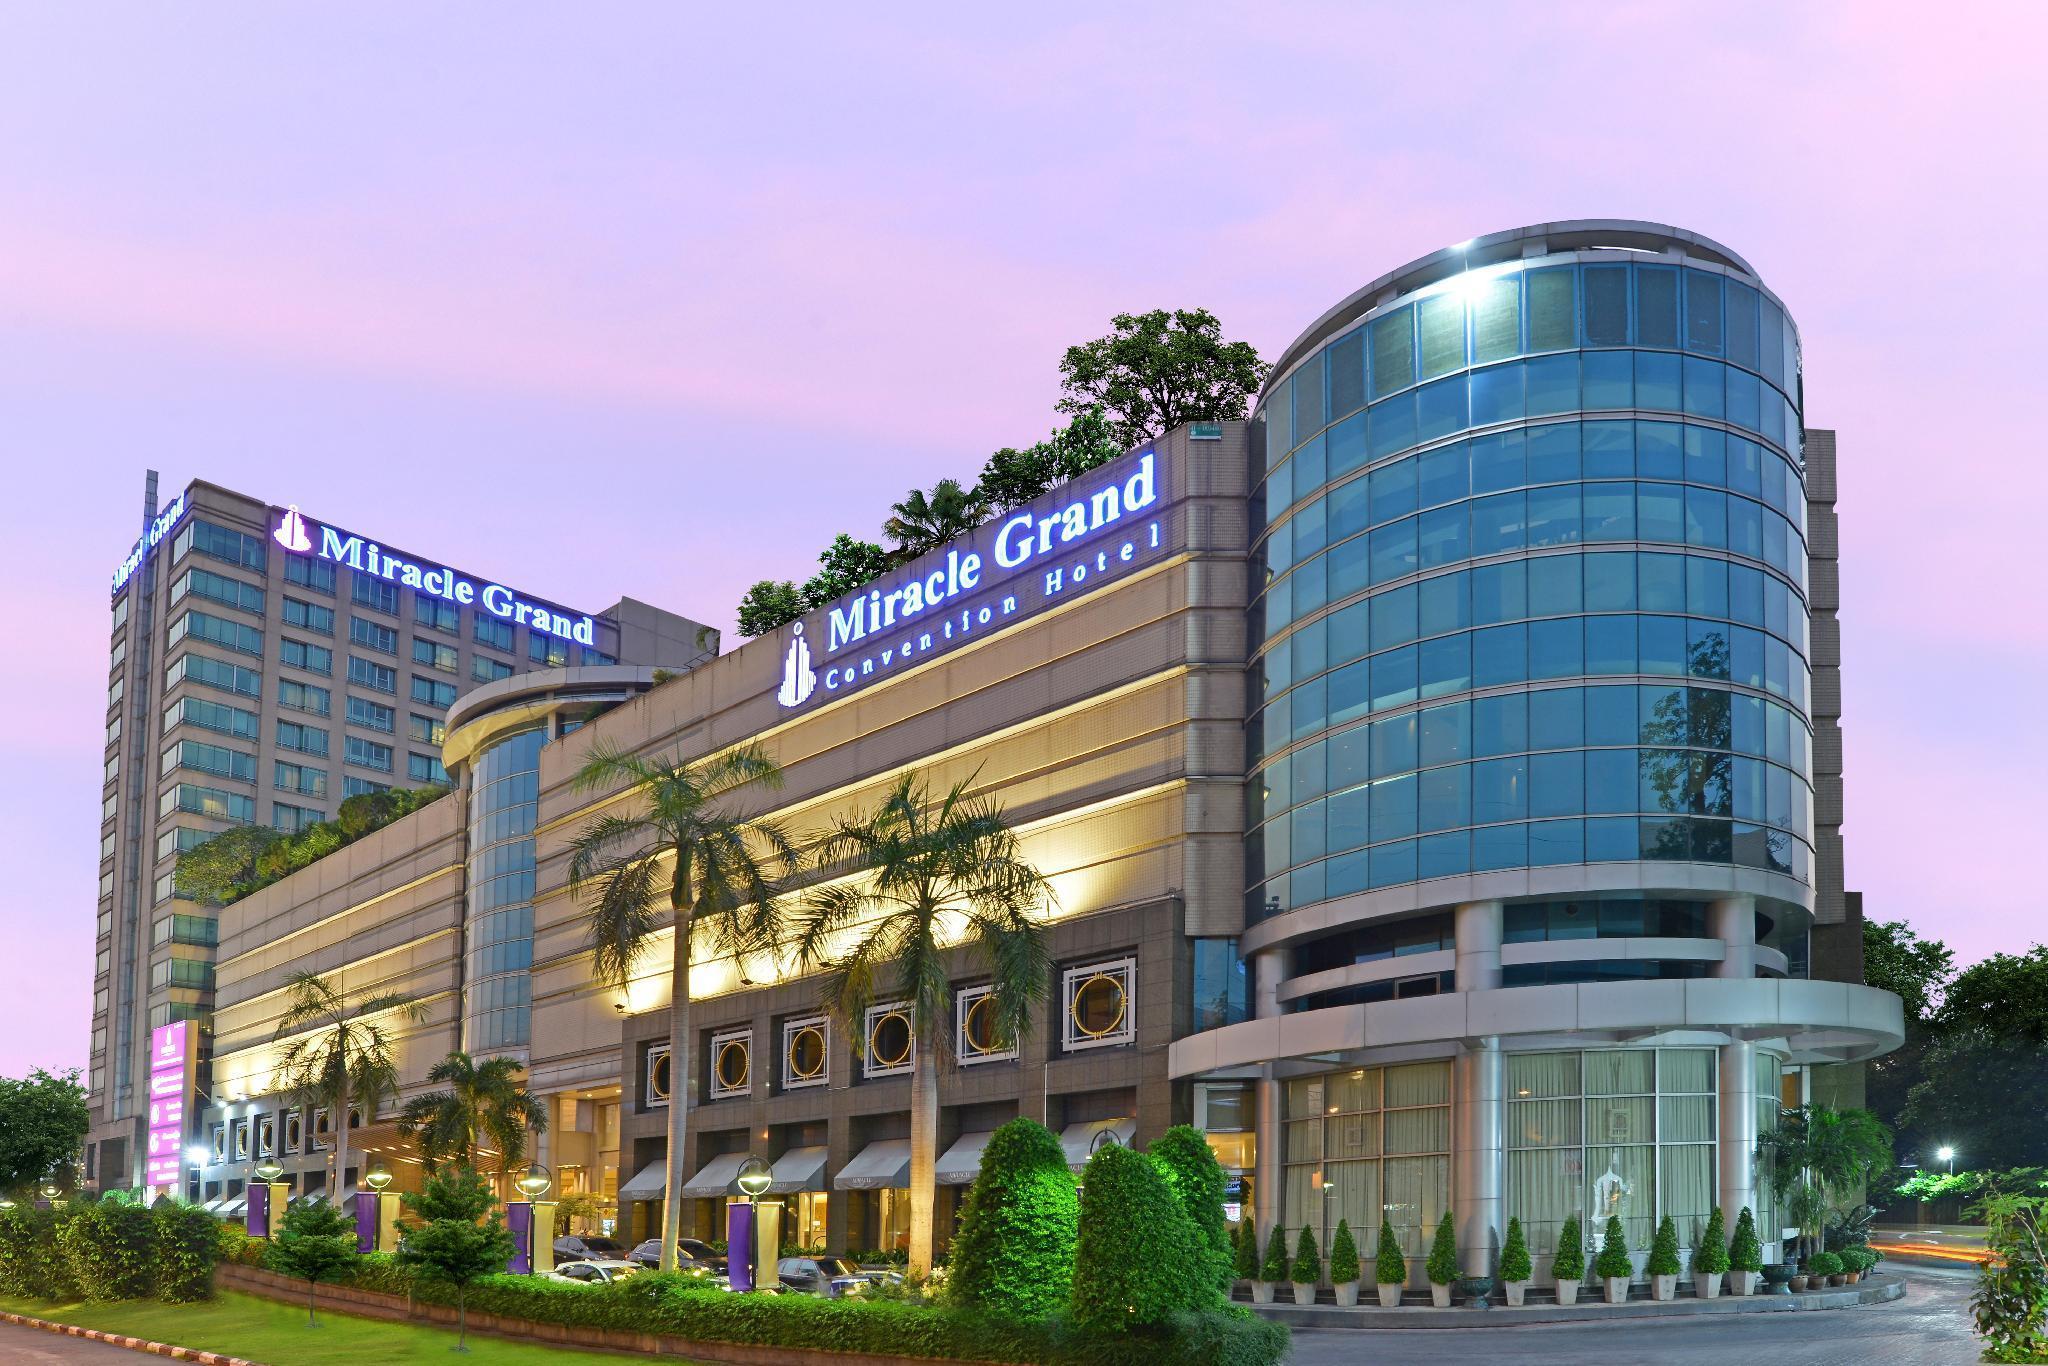 Miracle Grand Convention Hotel โรงแรมมิราเคิล แกรนด์ คอนเวนชั่น